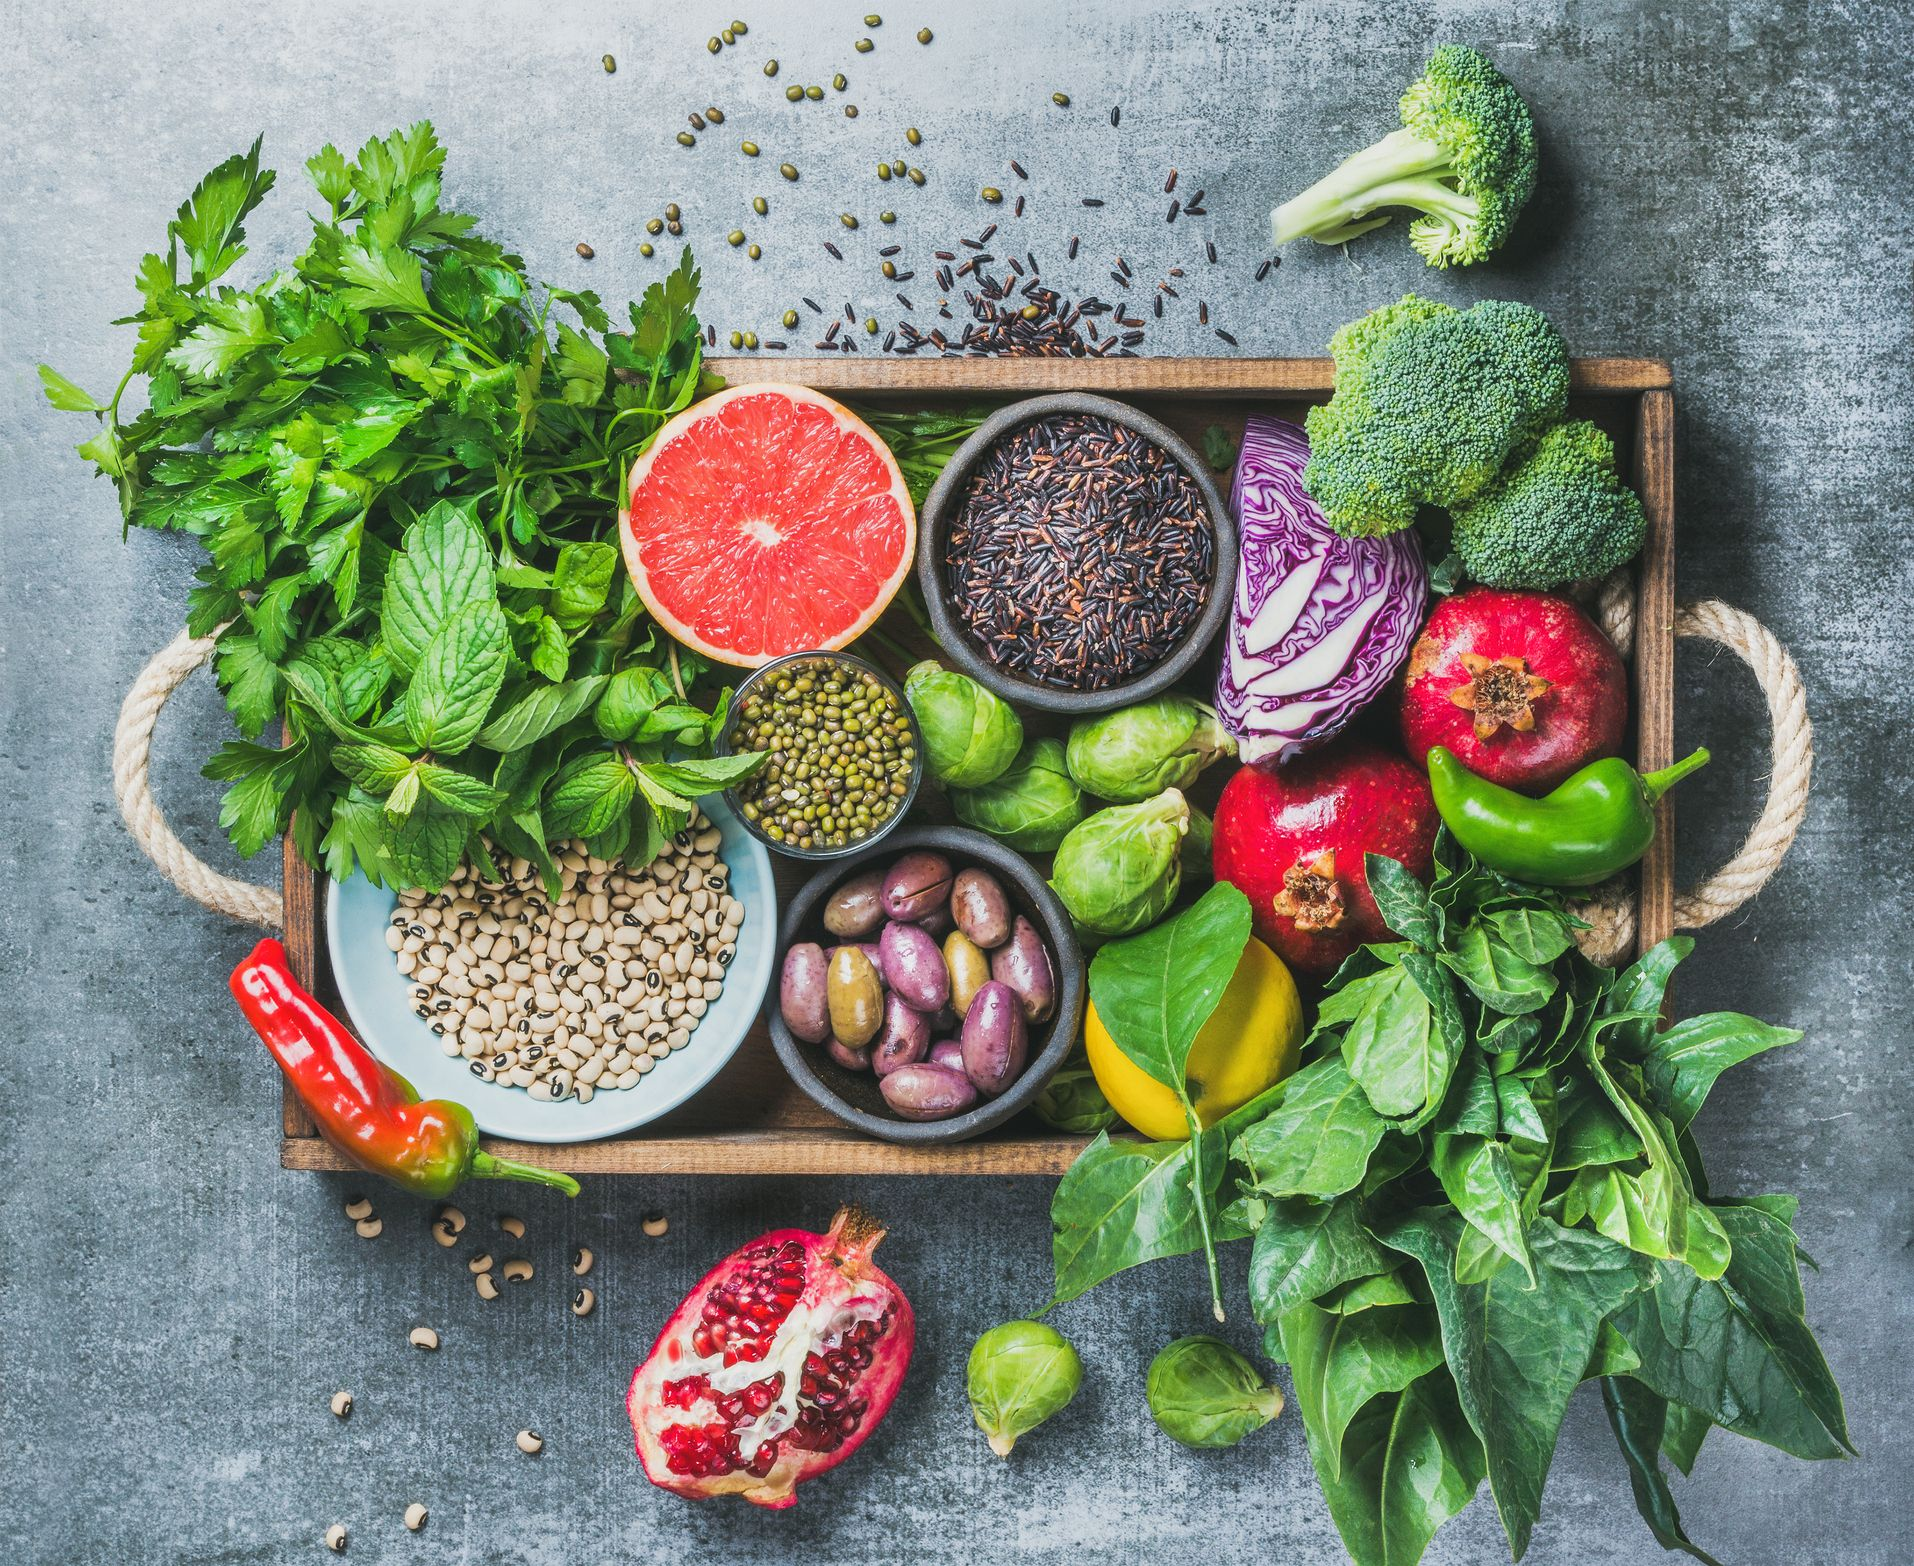 vegetables-fruit-healthy-food-stock